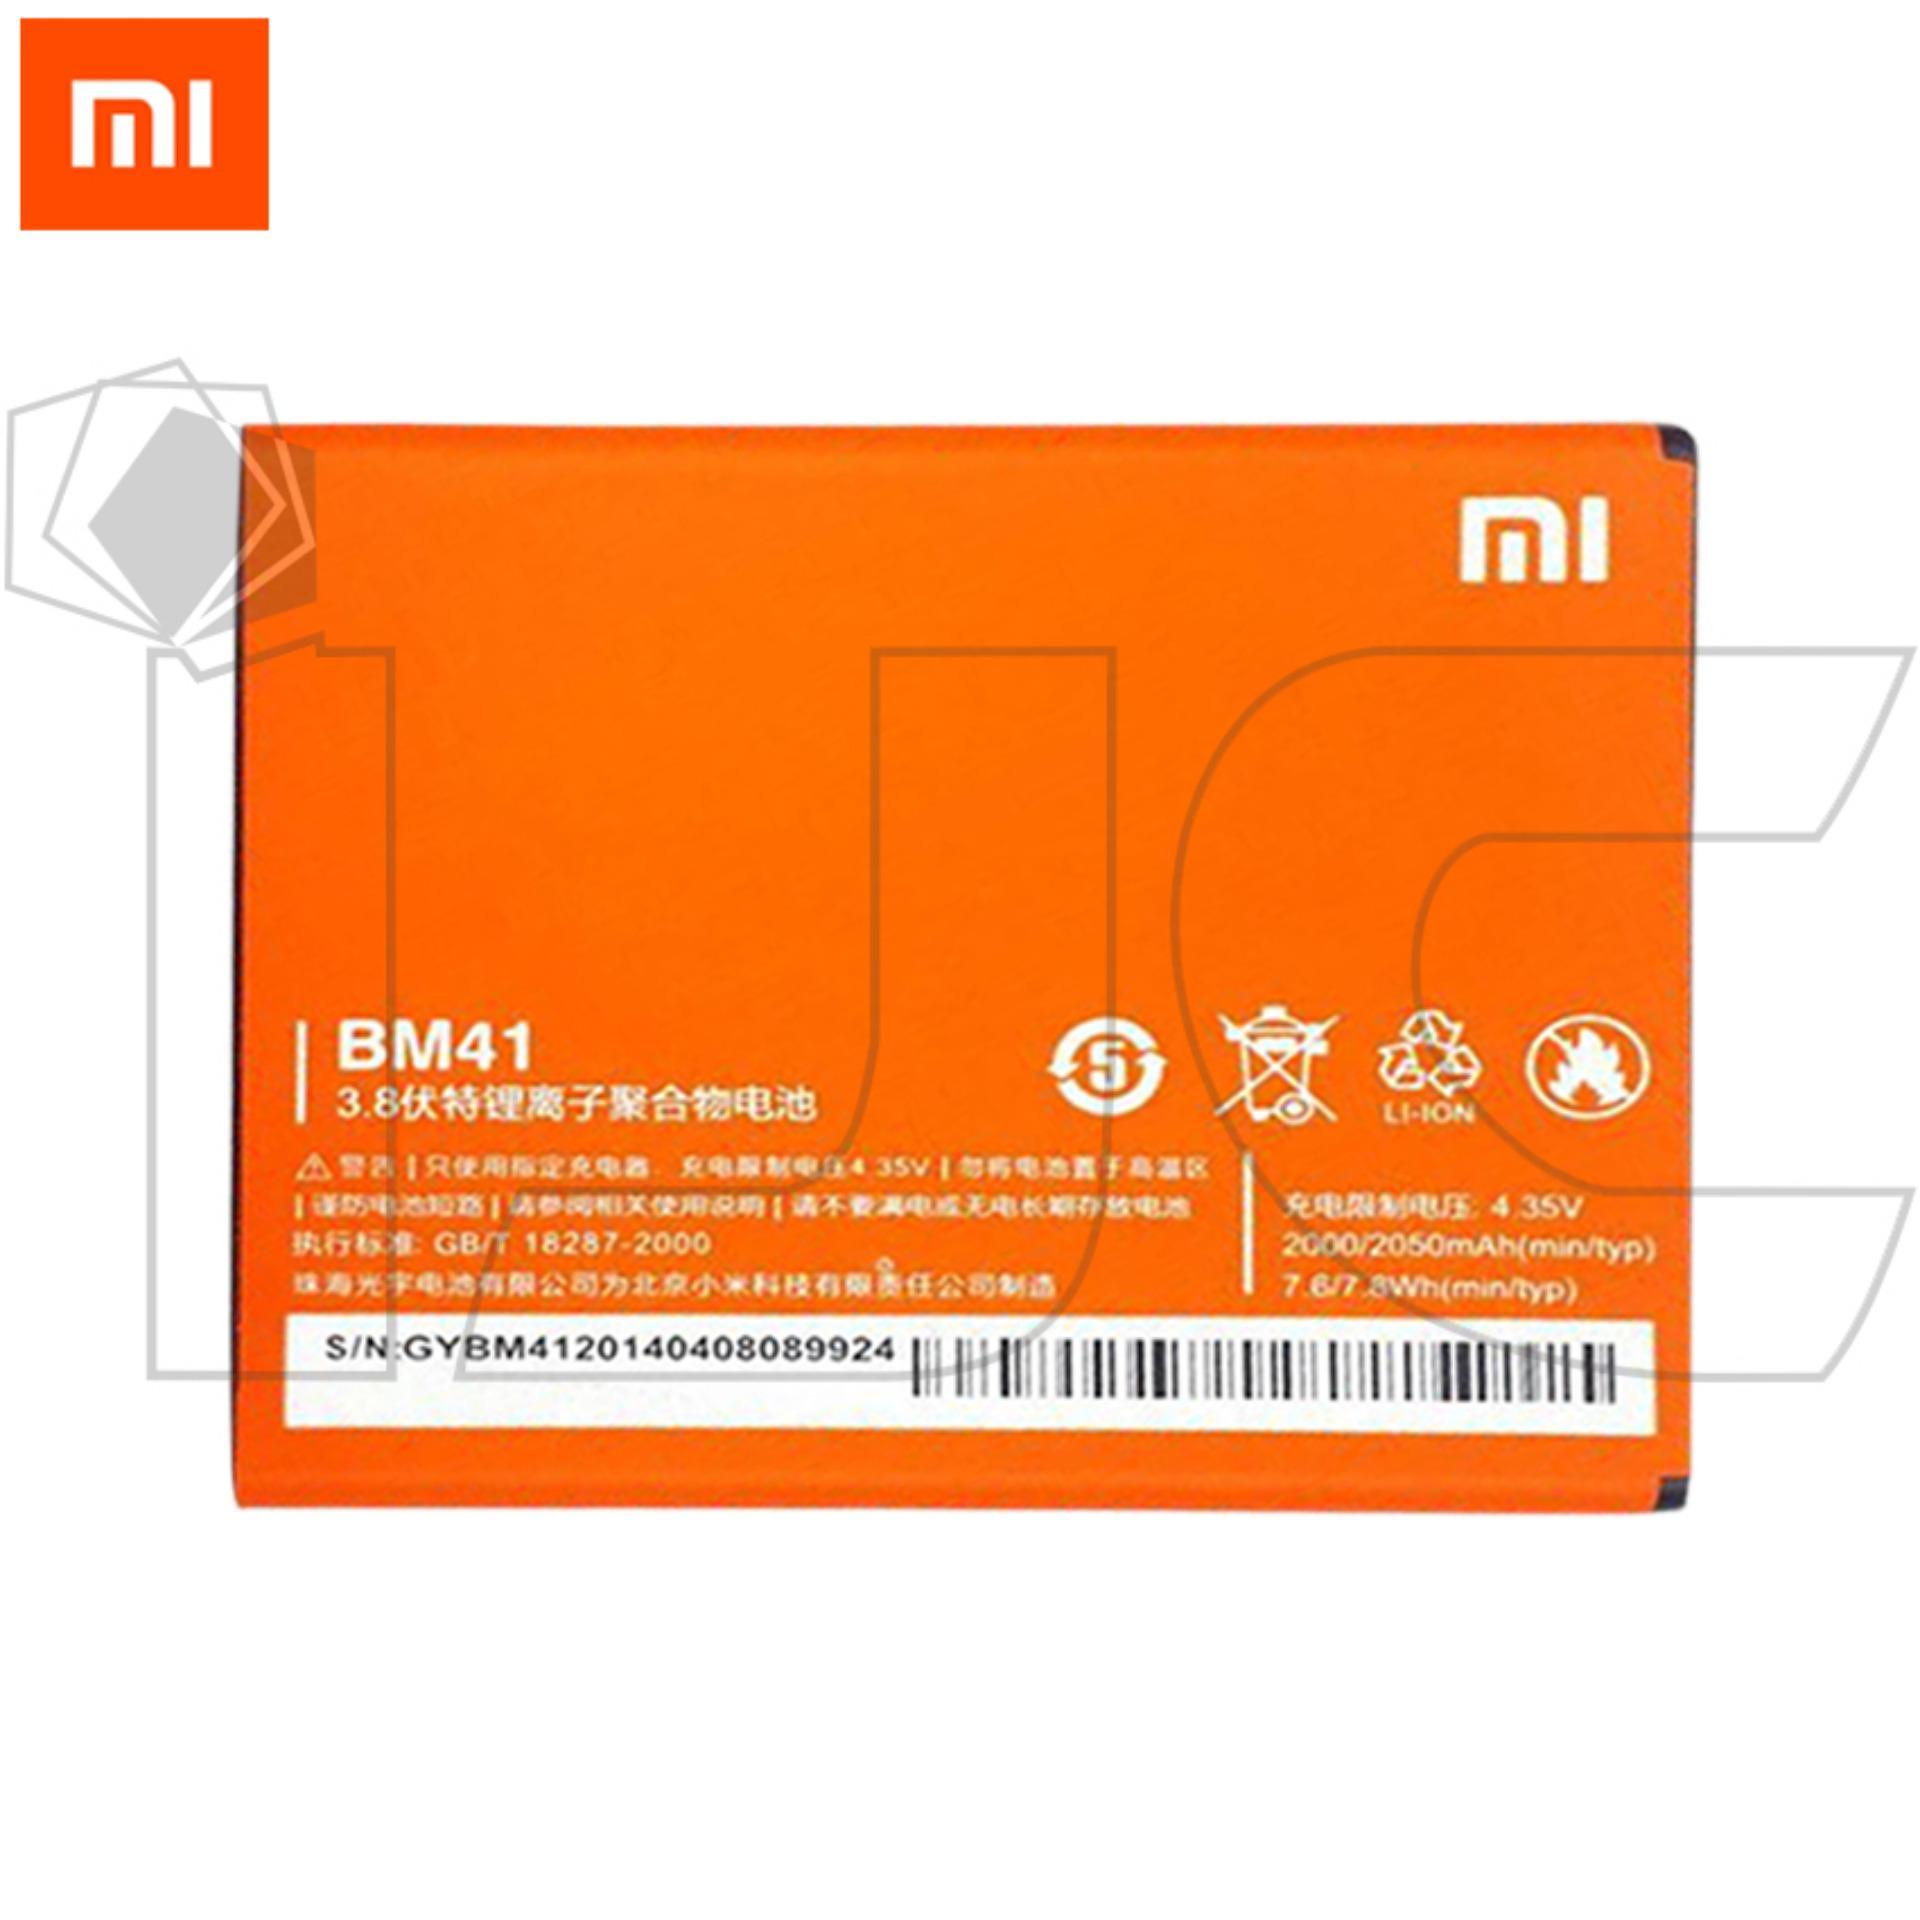 Toko Xiaomi Baterai Battery Bm41 For Xiaomi Redmi 1S Xiaomi Hongmi Figer Spiner Lengkap